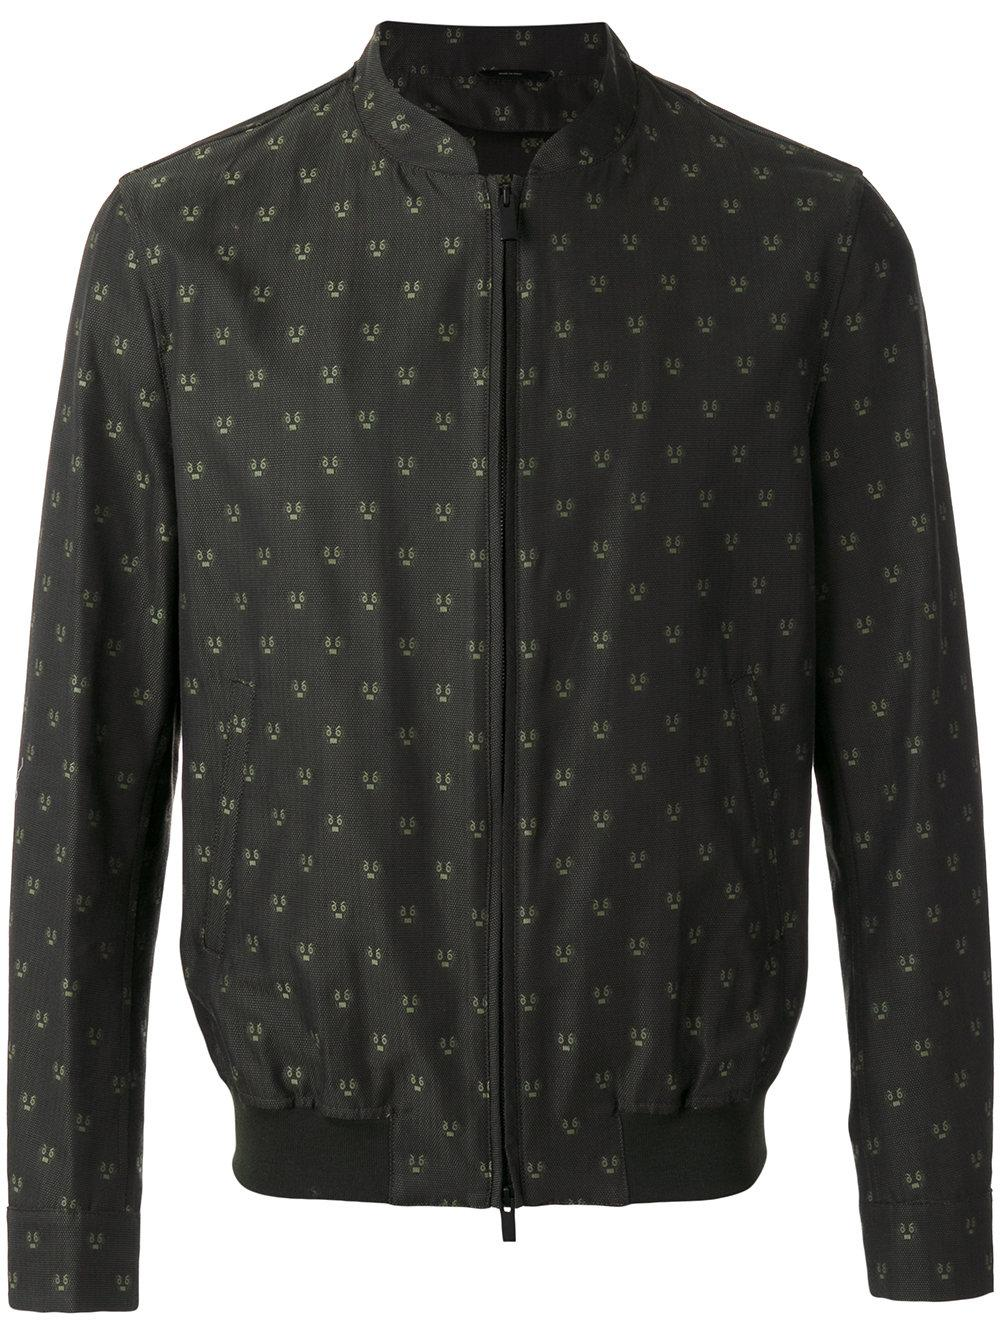 Fendi Embroidered Bomber Jacket in Green for Men